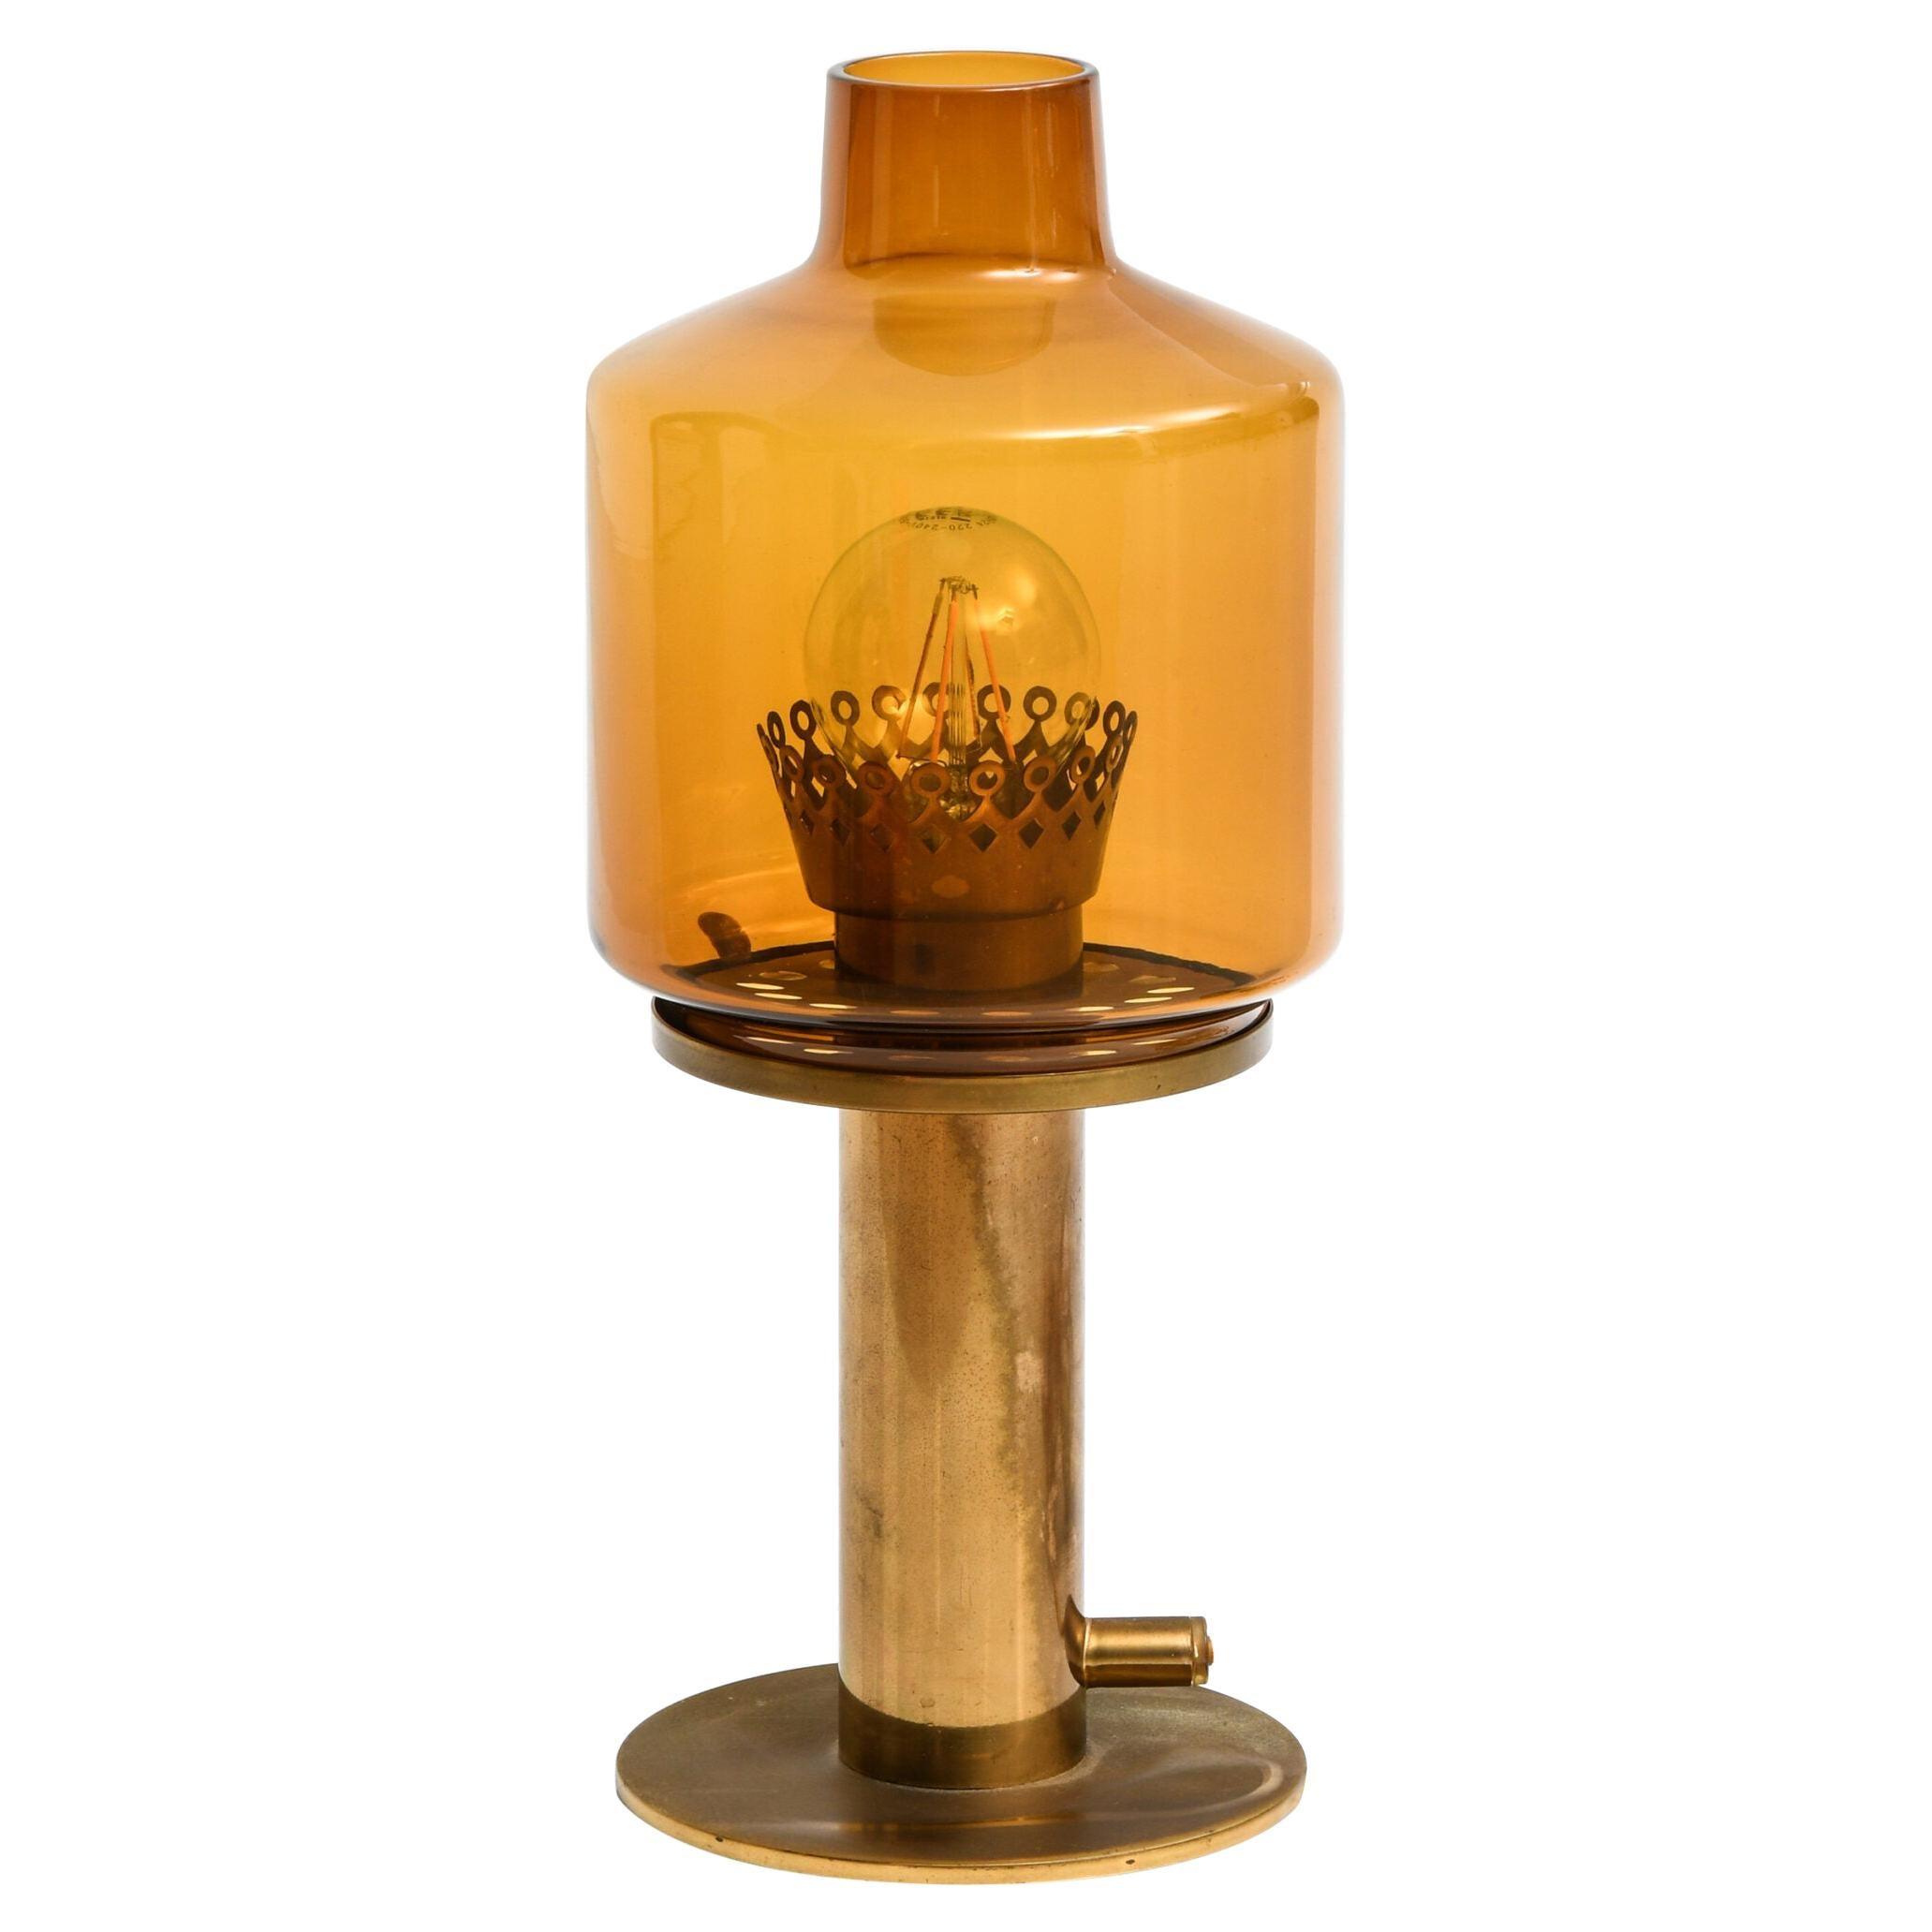 Hans-Agne Jakobsson Table Lamp B-102 by Hans-Agne Jakobsson AB in Markaryd